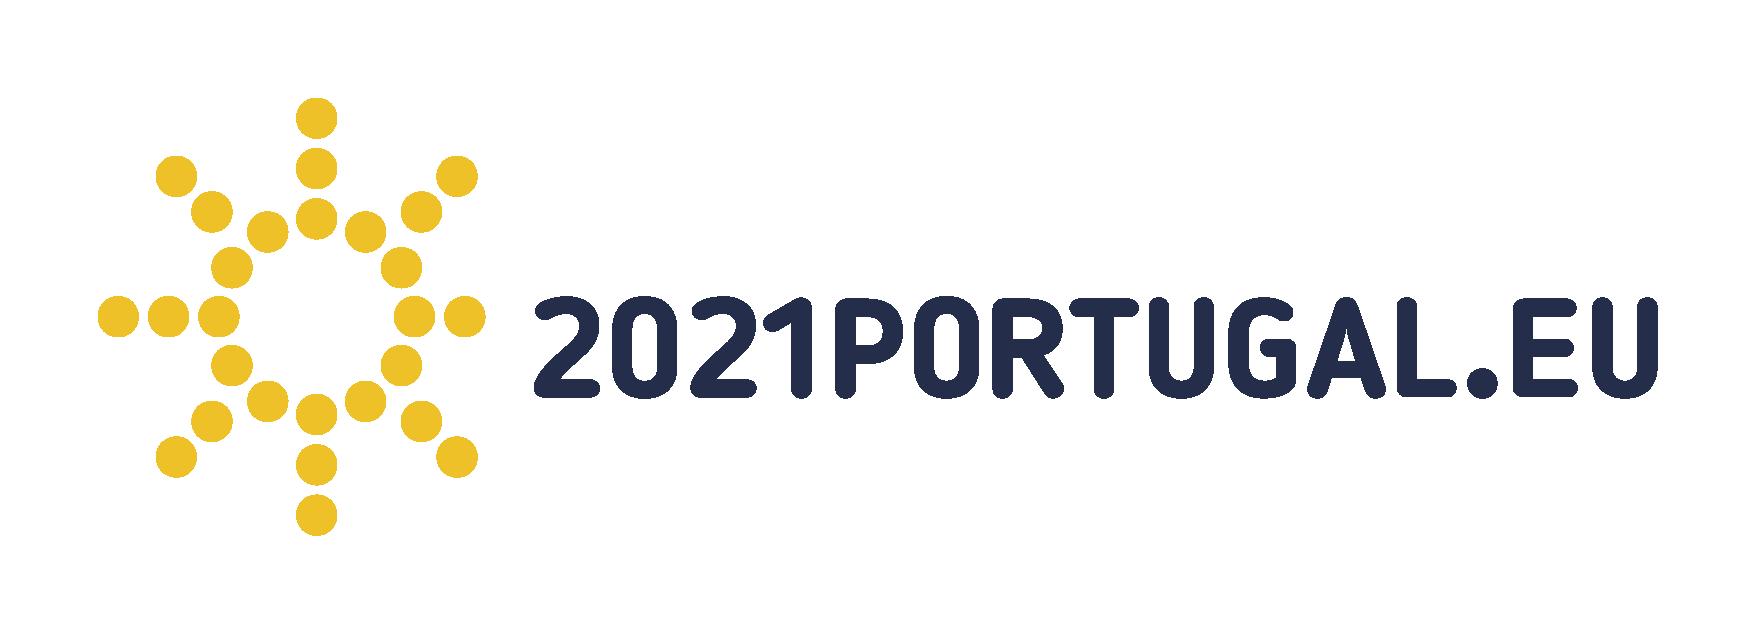 https://www.c-days.cncs.gov.pt/wp-content/uploads/2021/05/ppue_logo_rgb_11-164.png